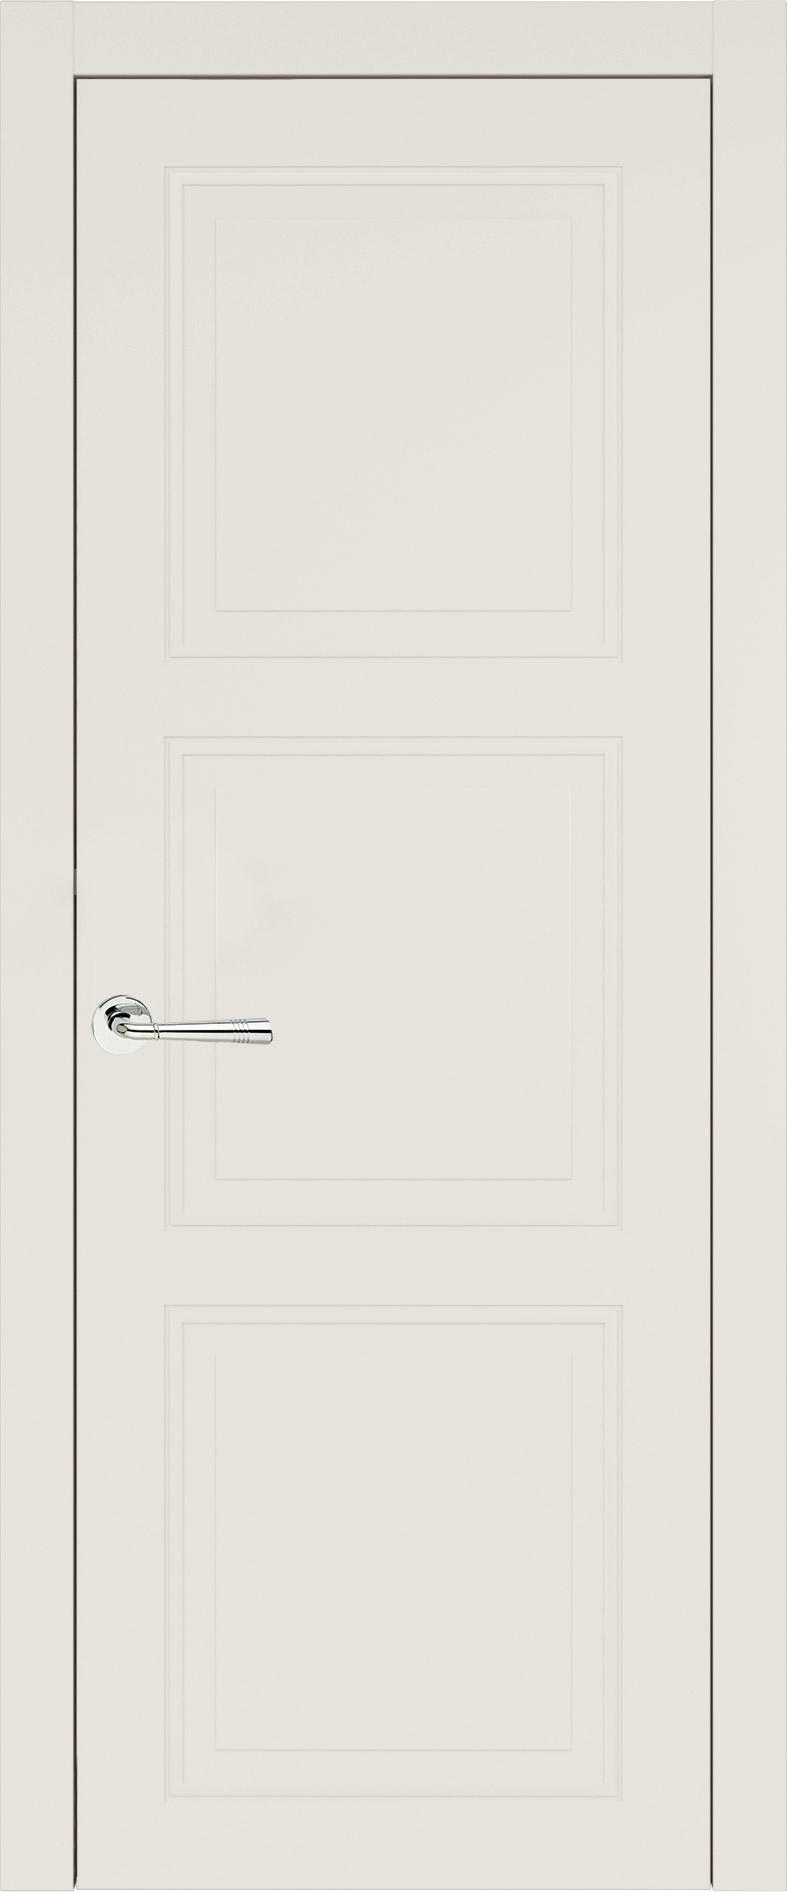 Milano Neo Classic цвет - Бежевая эмаль (RAL 9010) Без стекла (ДГ)